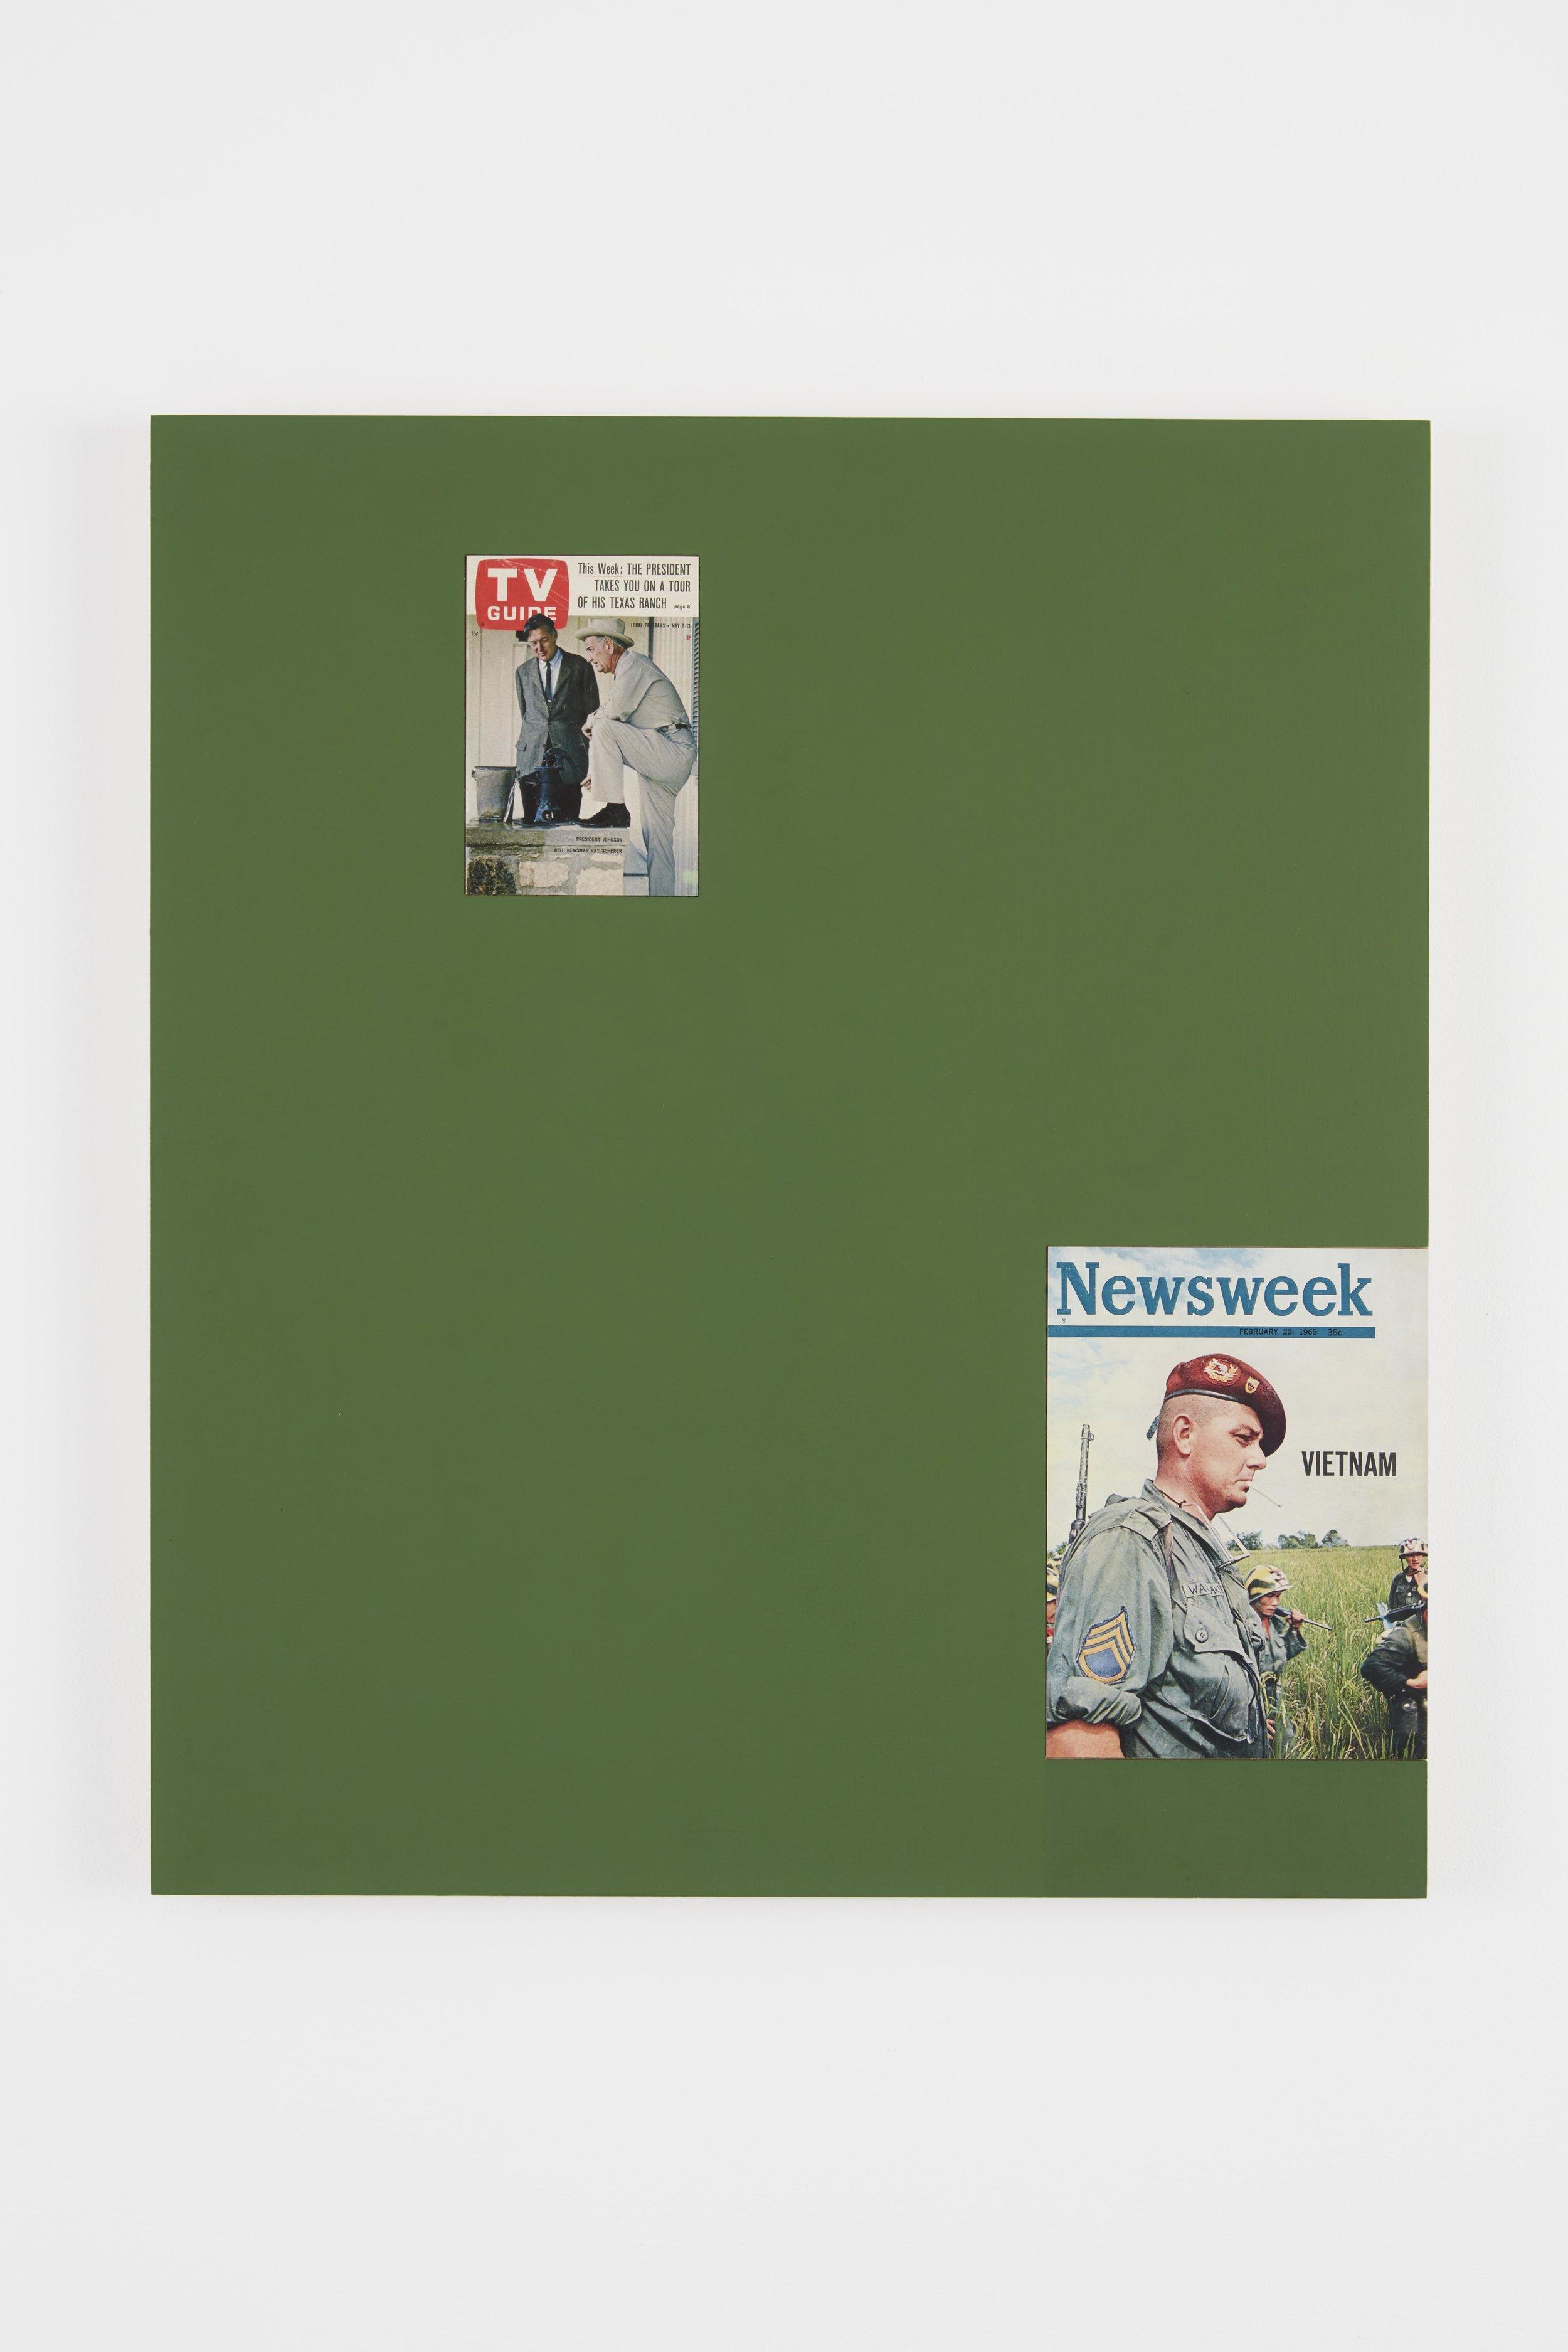 Matthew Brannon,  Éphémère (Television War) , 2018, Oil on linen, UV pigment print, 32 x 27.5 inches. Image courtesy the artist and Casey Kaplan, New York. Photo: Jason Wyche